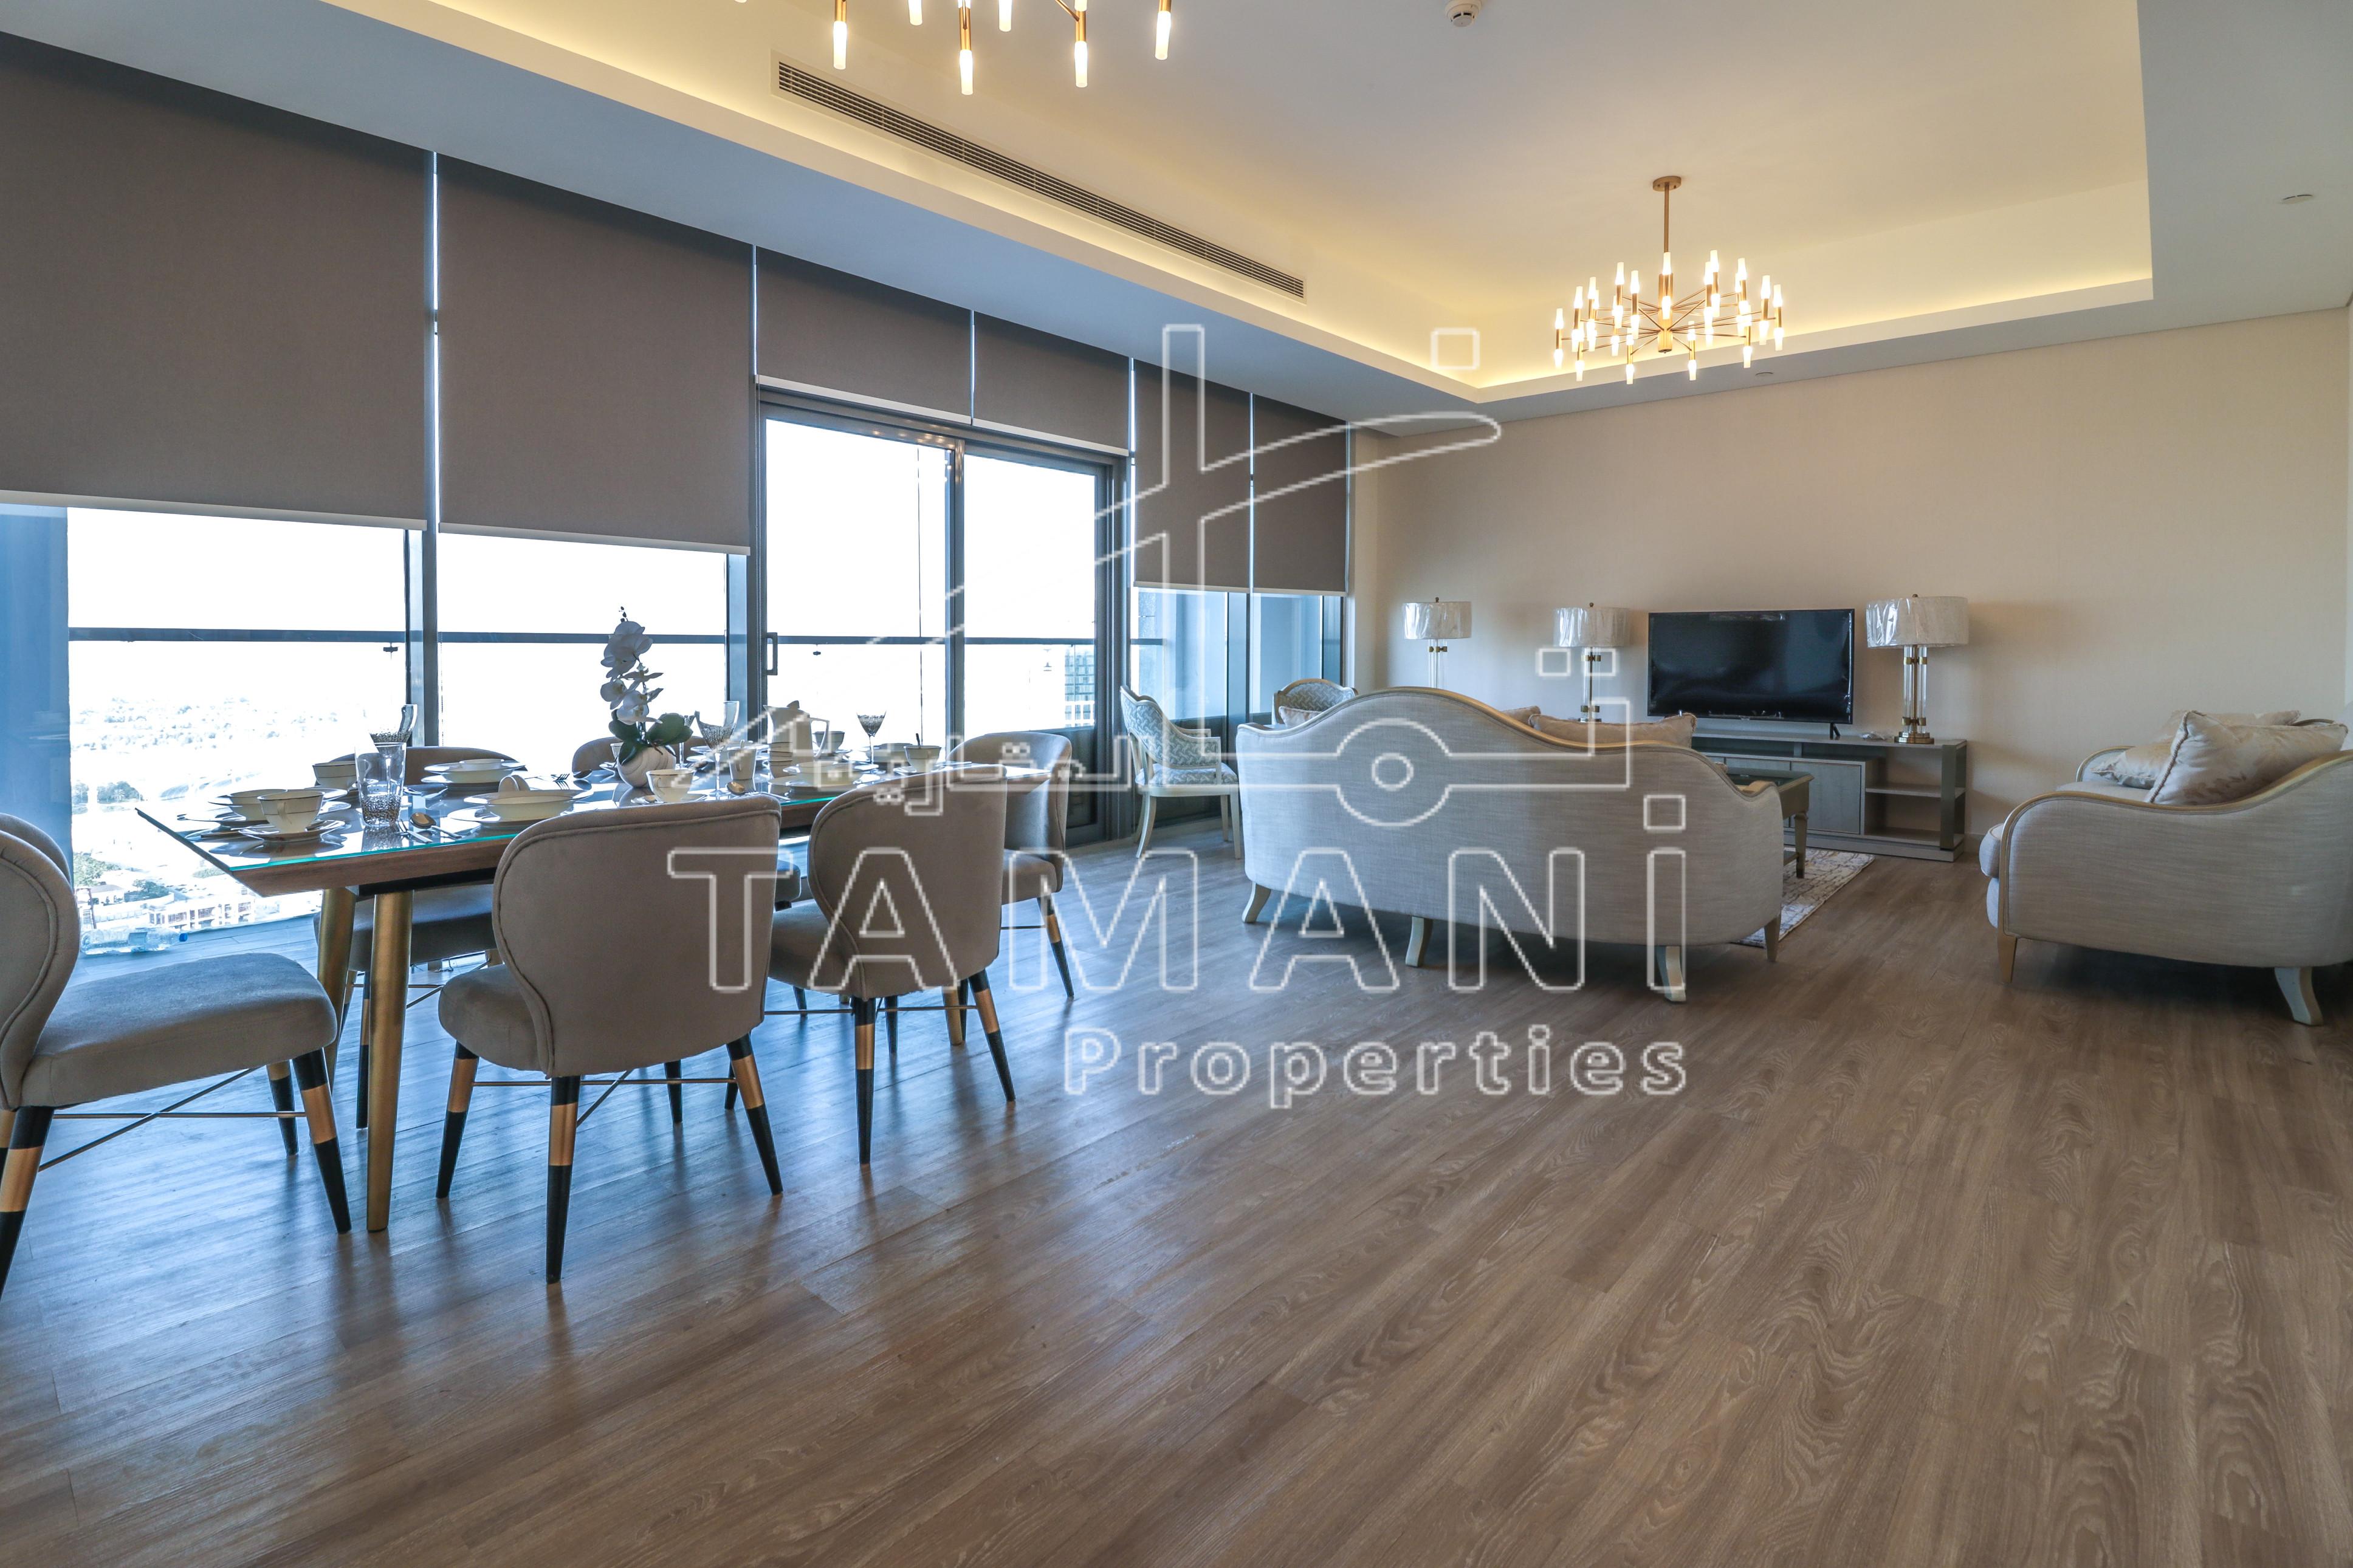 Brand new luxury furniture upgraded 150k - Mada Residences by ARTAR